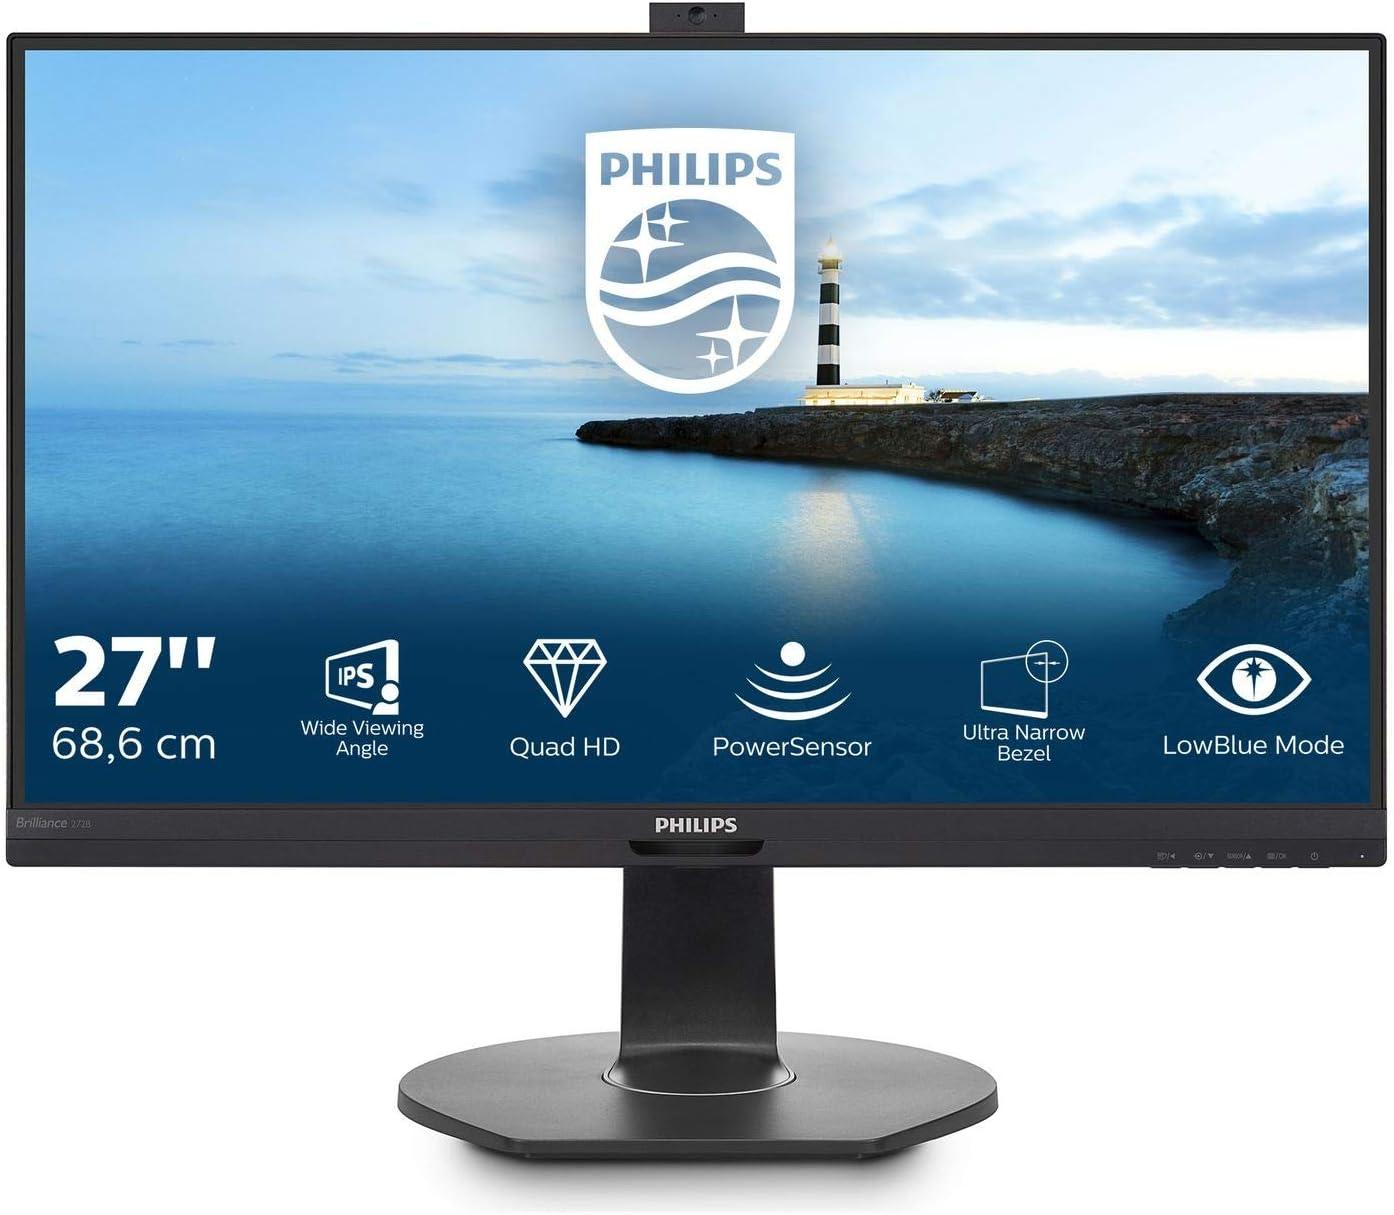 Philips 272b7qptkeb 27 Zoll Qhd Monitor Webcam Computer Zubehör